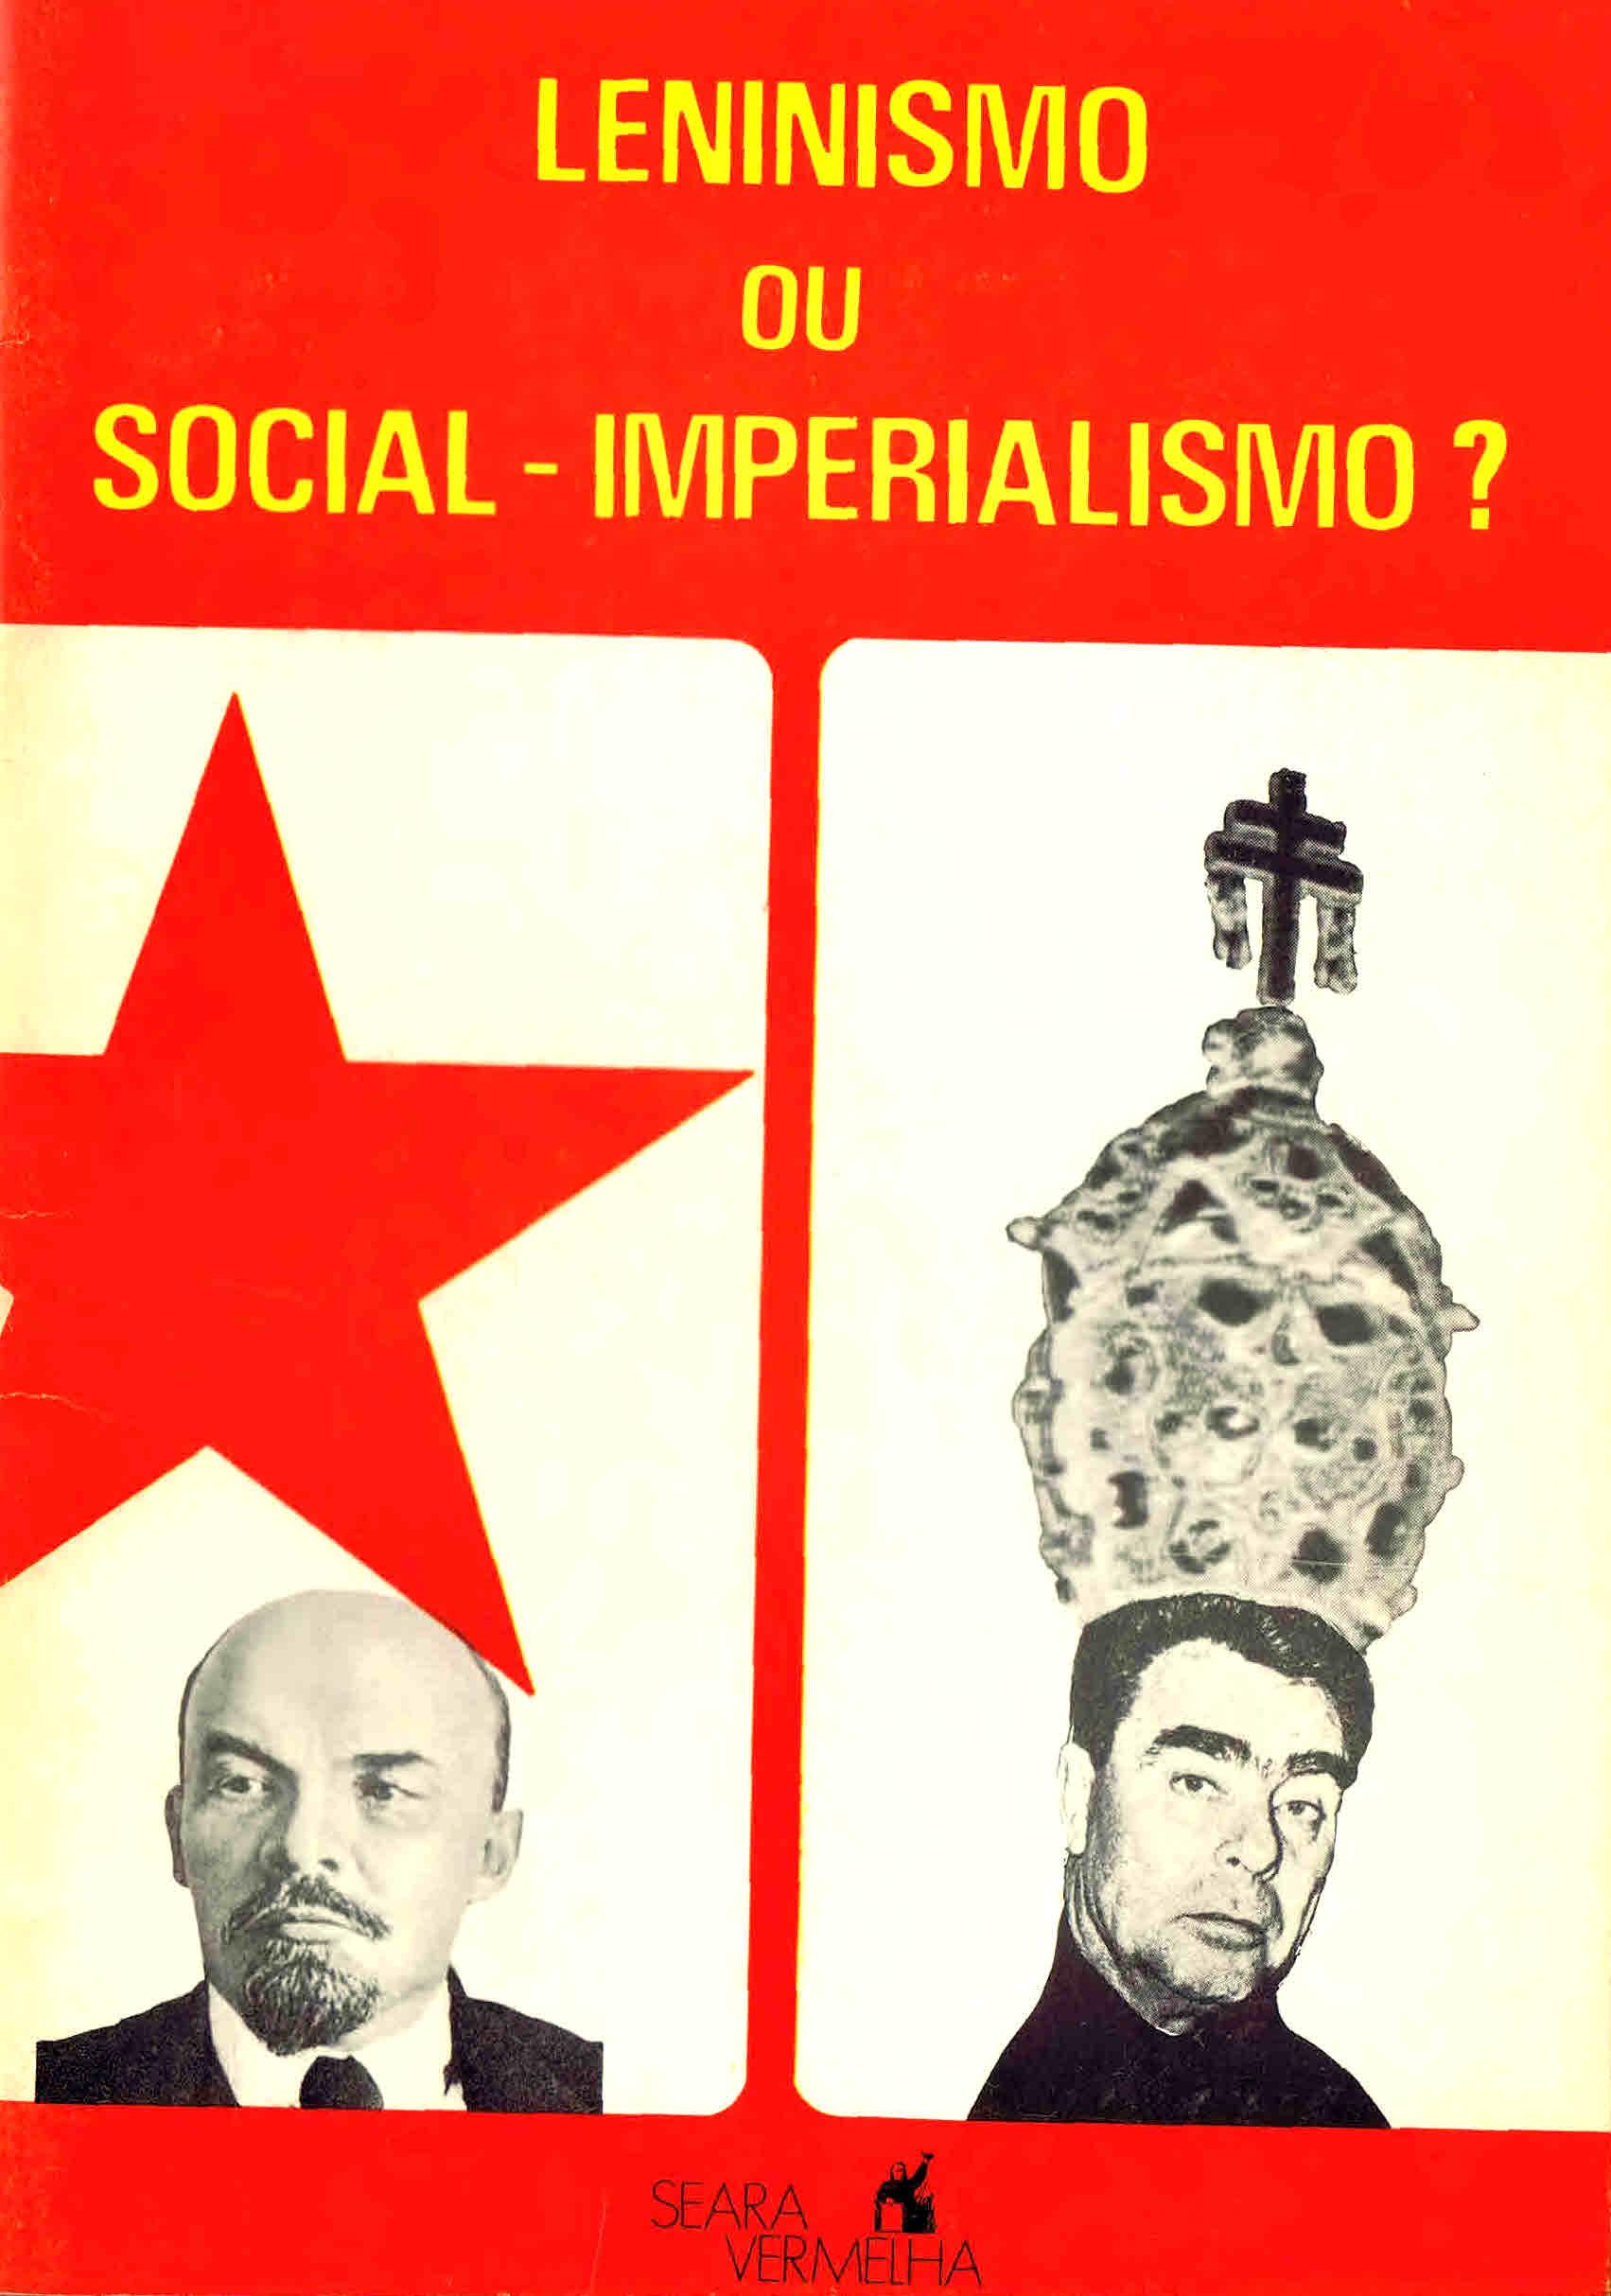 leninismo ou social imperialismo